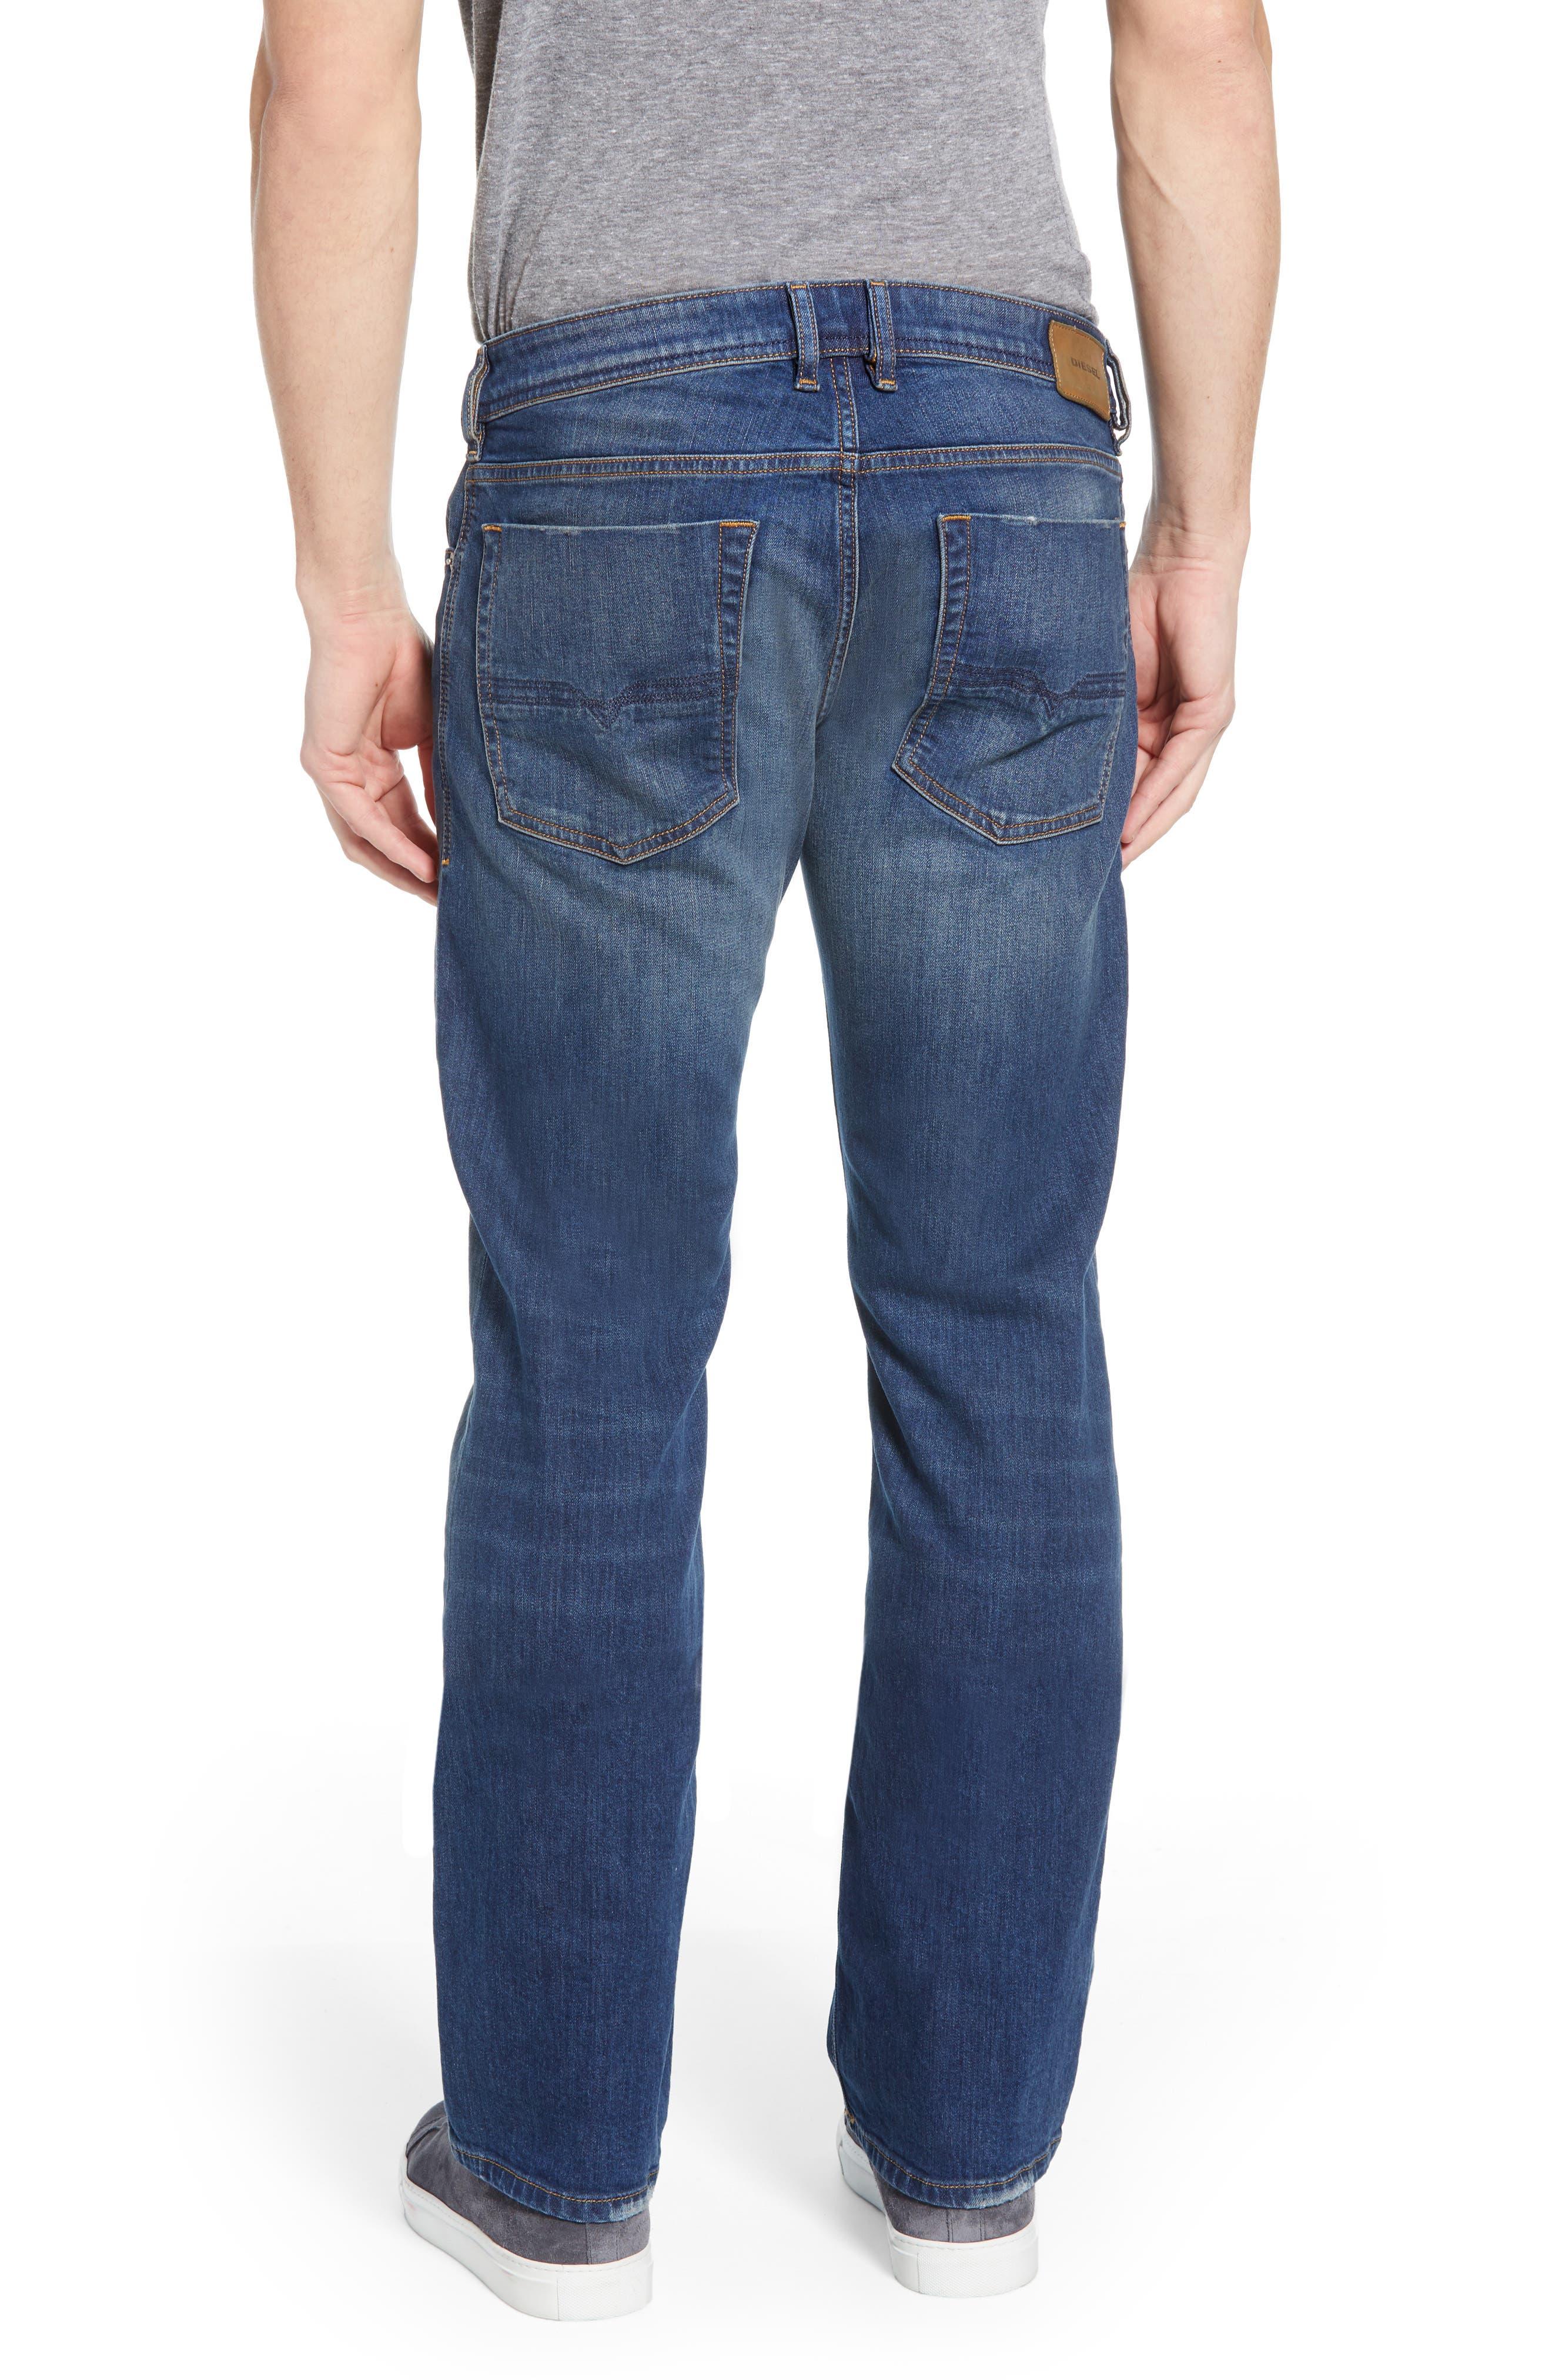 DIESEL<SUP>®</SUP>, Zatiny Bootcut Jeans, Alternate thumbnail 2, color, DENIM